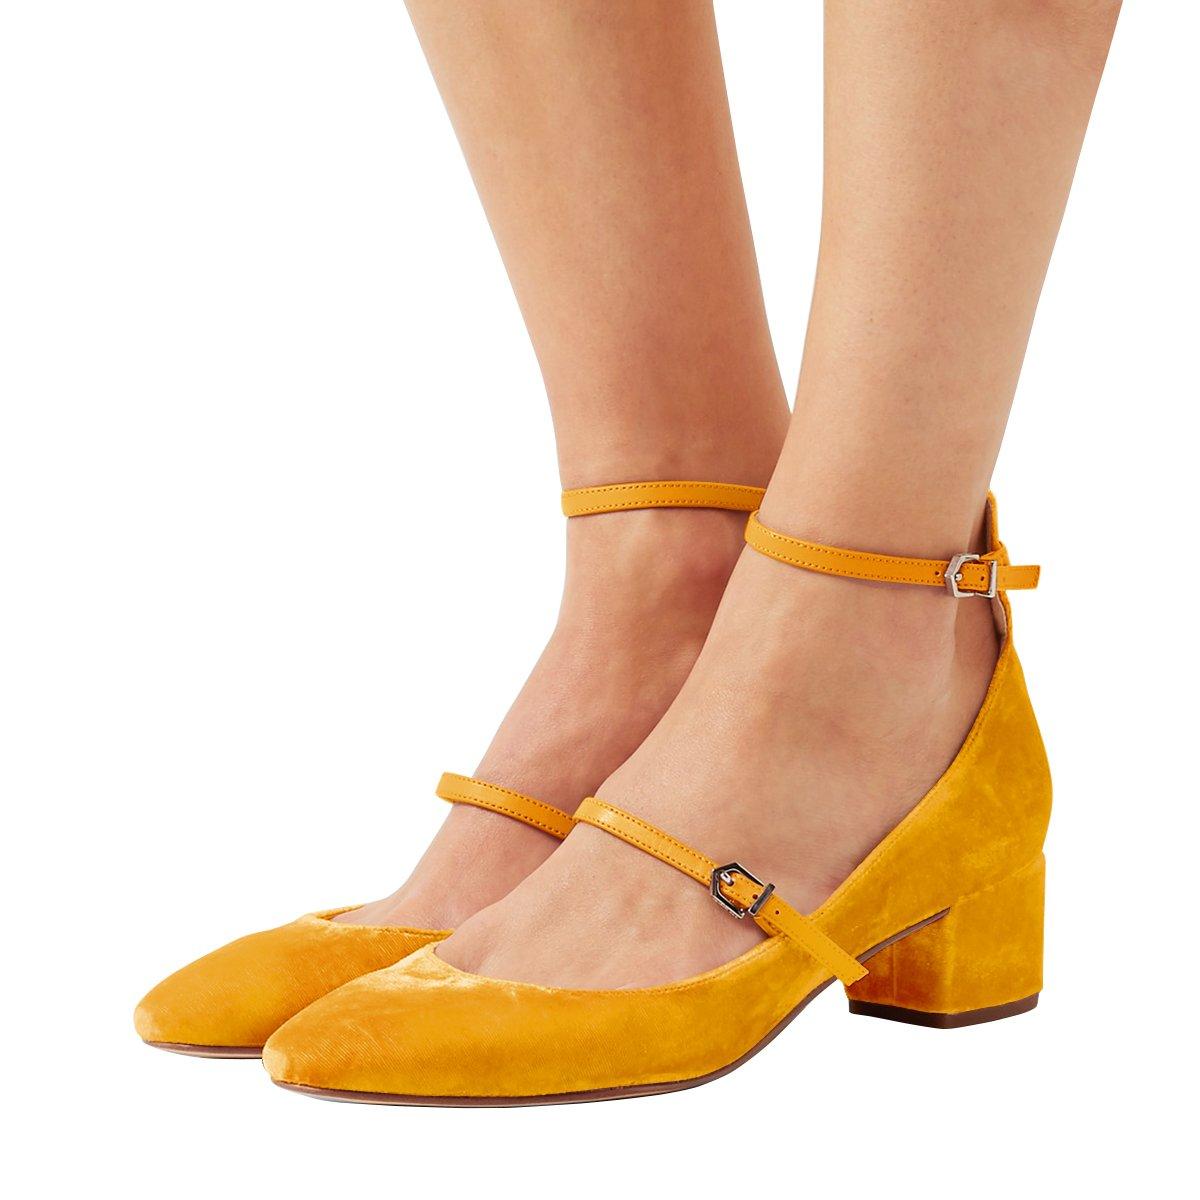 XYD Womens Retro Marry Jane Block Heel Pumps Velvet Ankle Strap Round Toe Dress Shoes Size 9.5 Orange